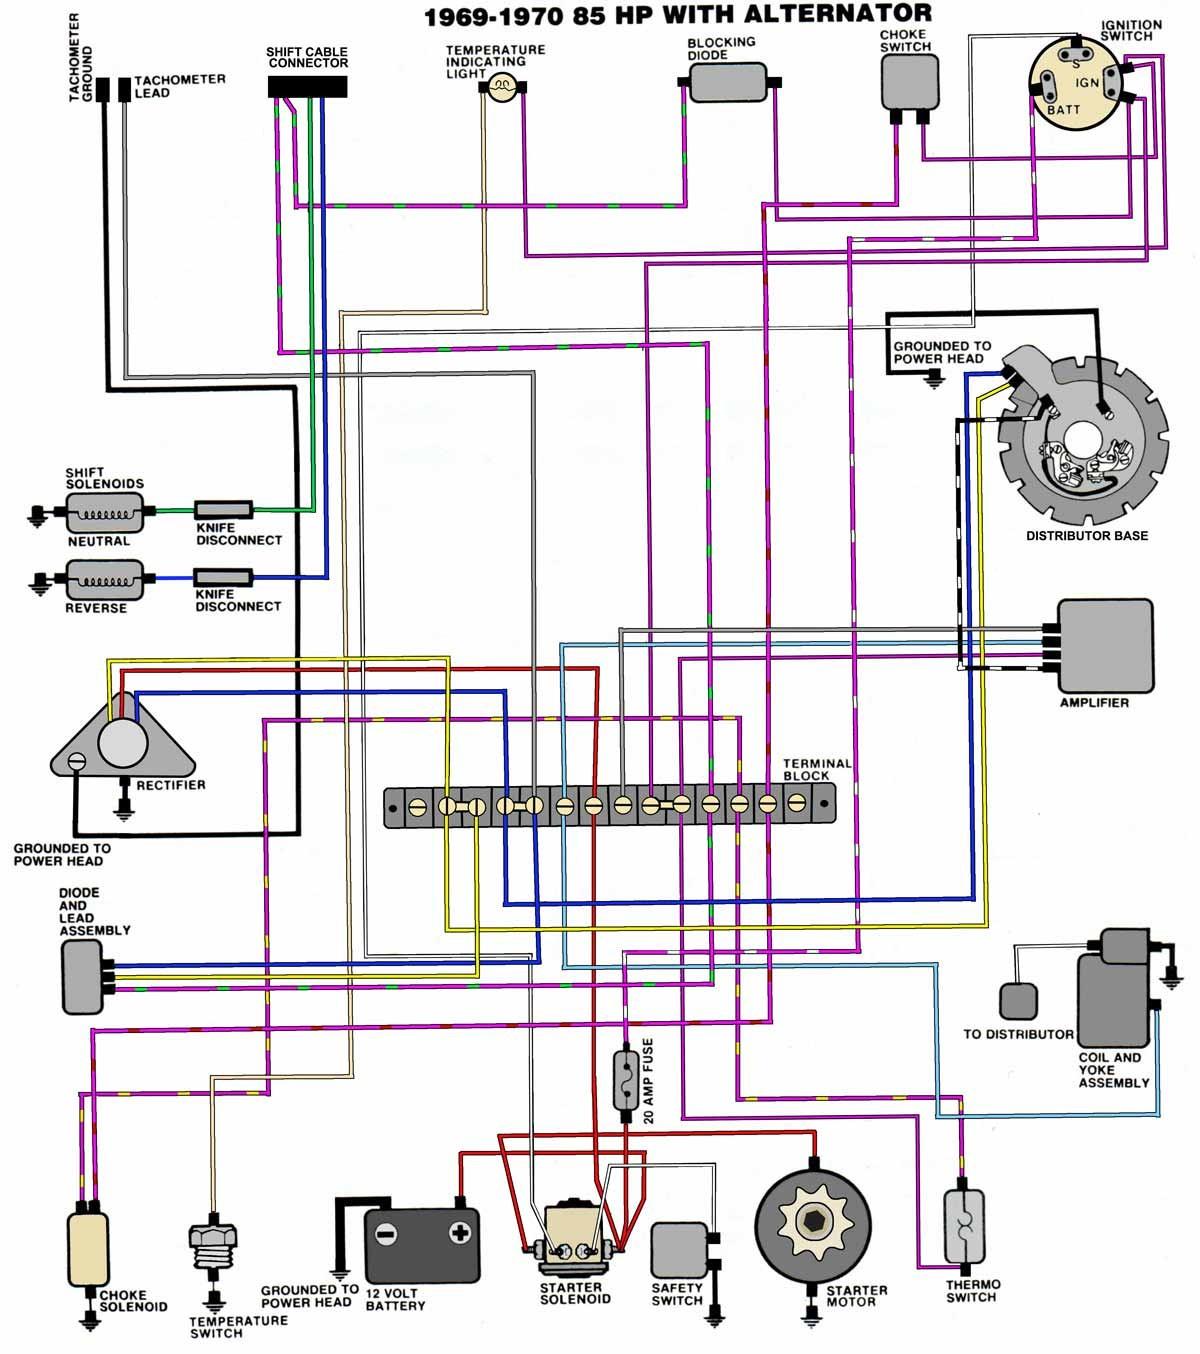 Evinrude Simplex Control Box Diagram Trusted Wiring Diagrams Johnson Controls Circuit And Hub U2022 Omc